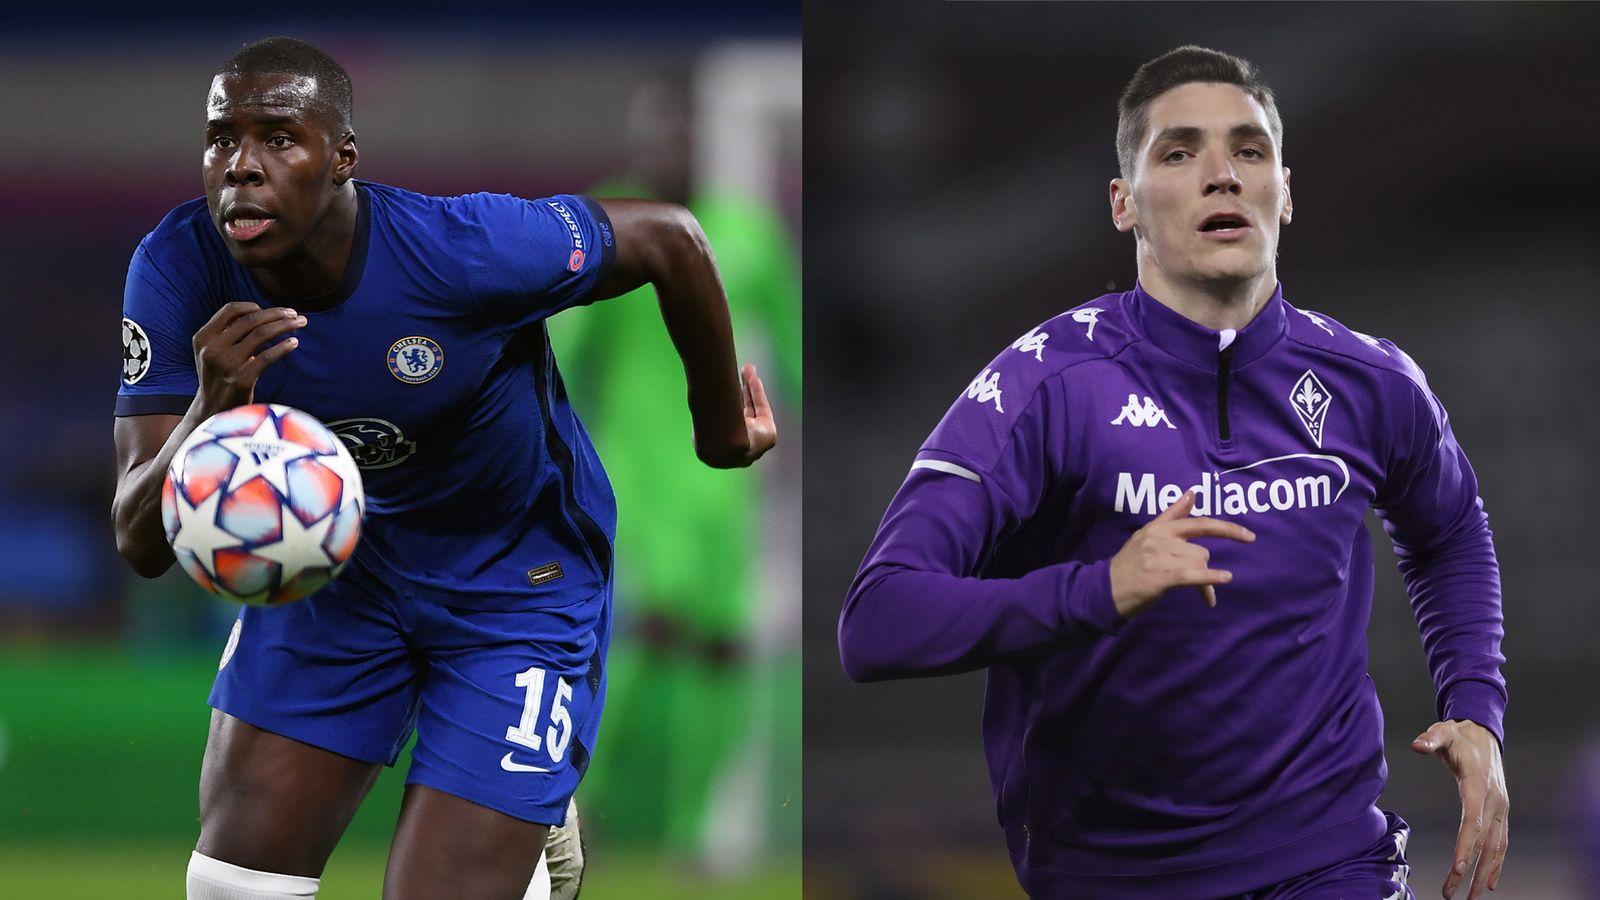 چلسی / فیورنتینا / Serie A / Chelsea / Premier League